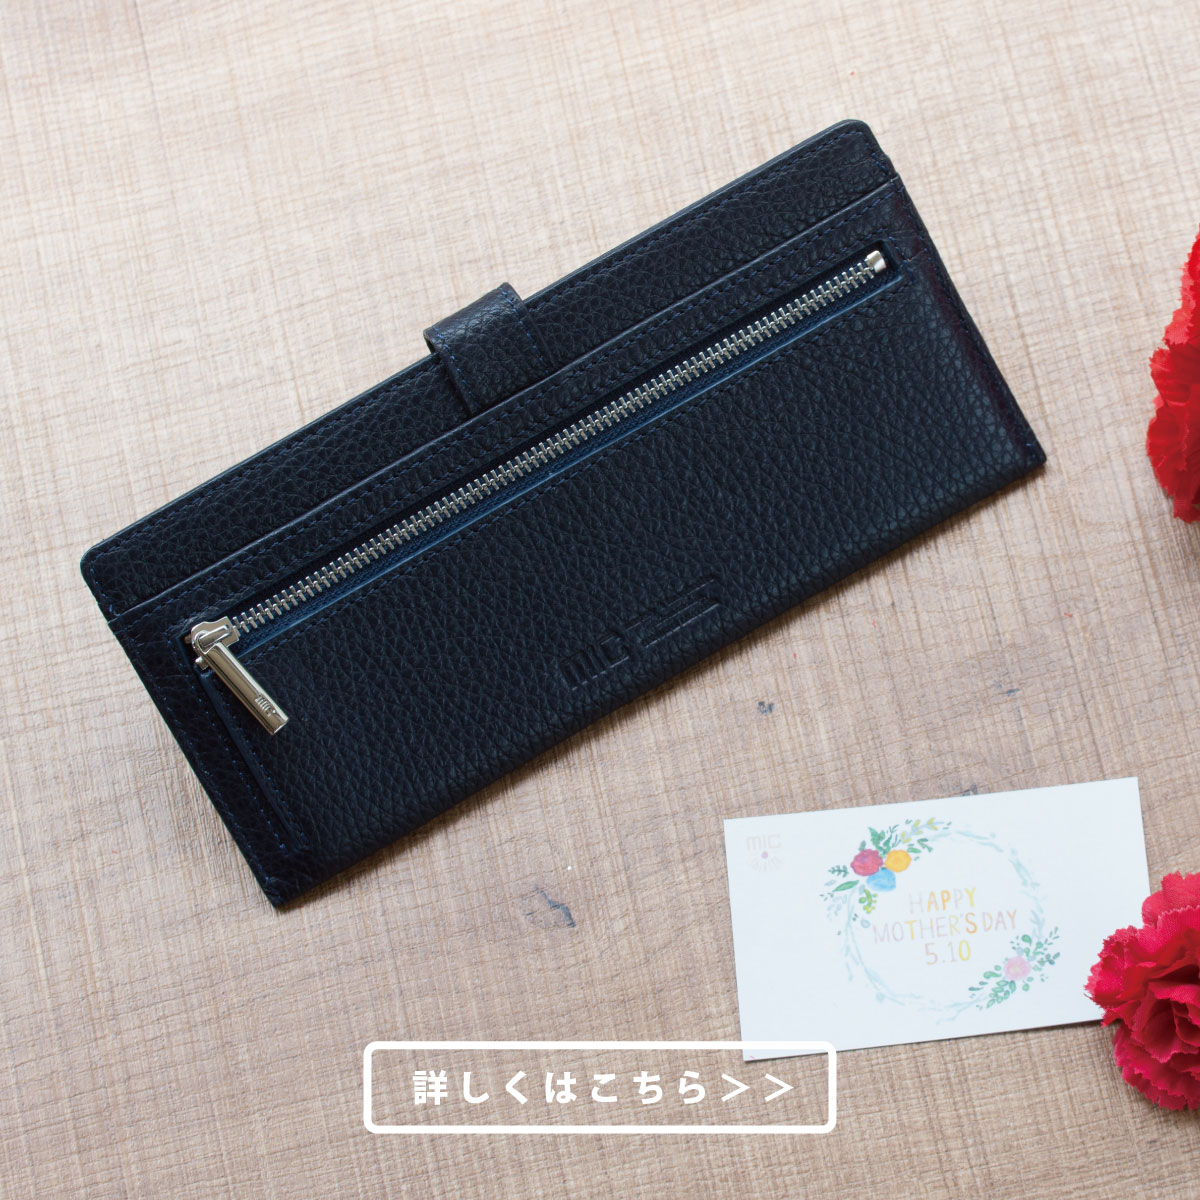 MH1364 / シュランク 薄型長財布(小銭入れ付き)